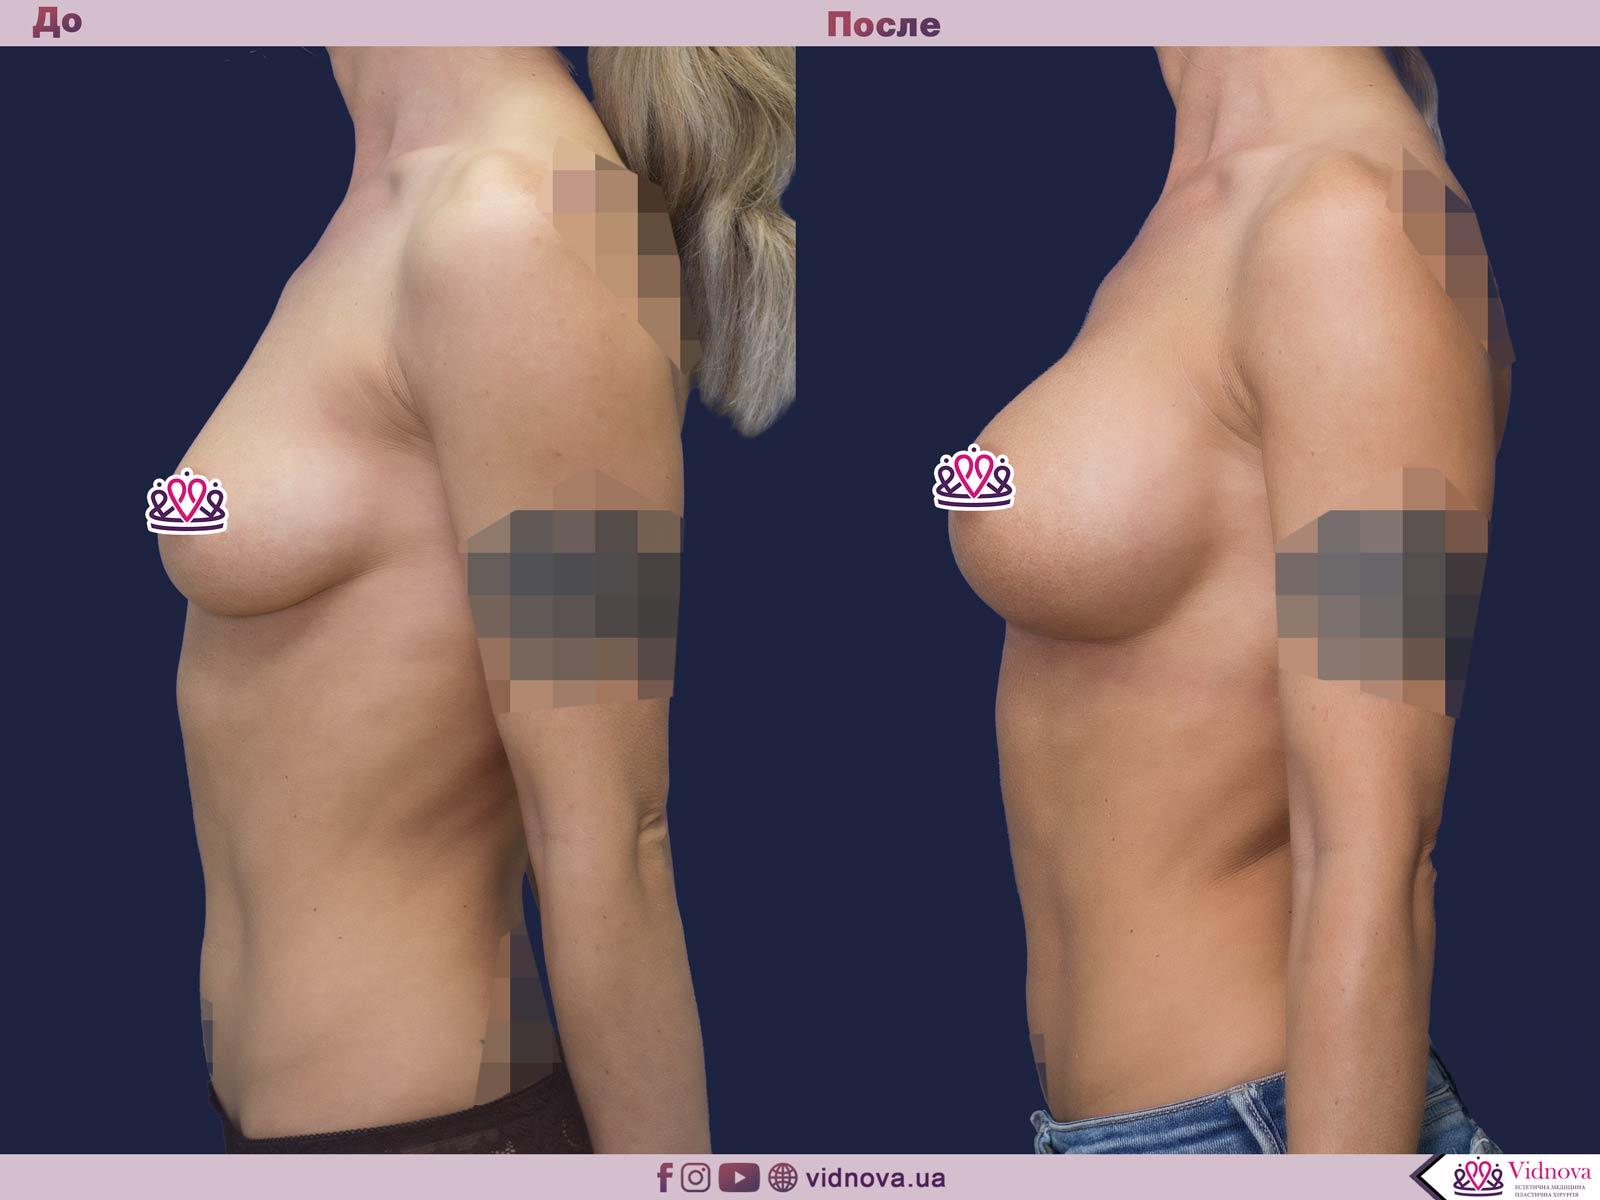 Увеличение груди: Фото ДО и ПОСЛЕ - Пример №57-3 - Клиника Vidnova